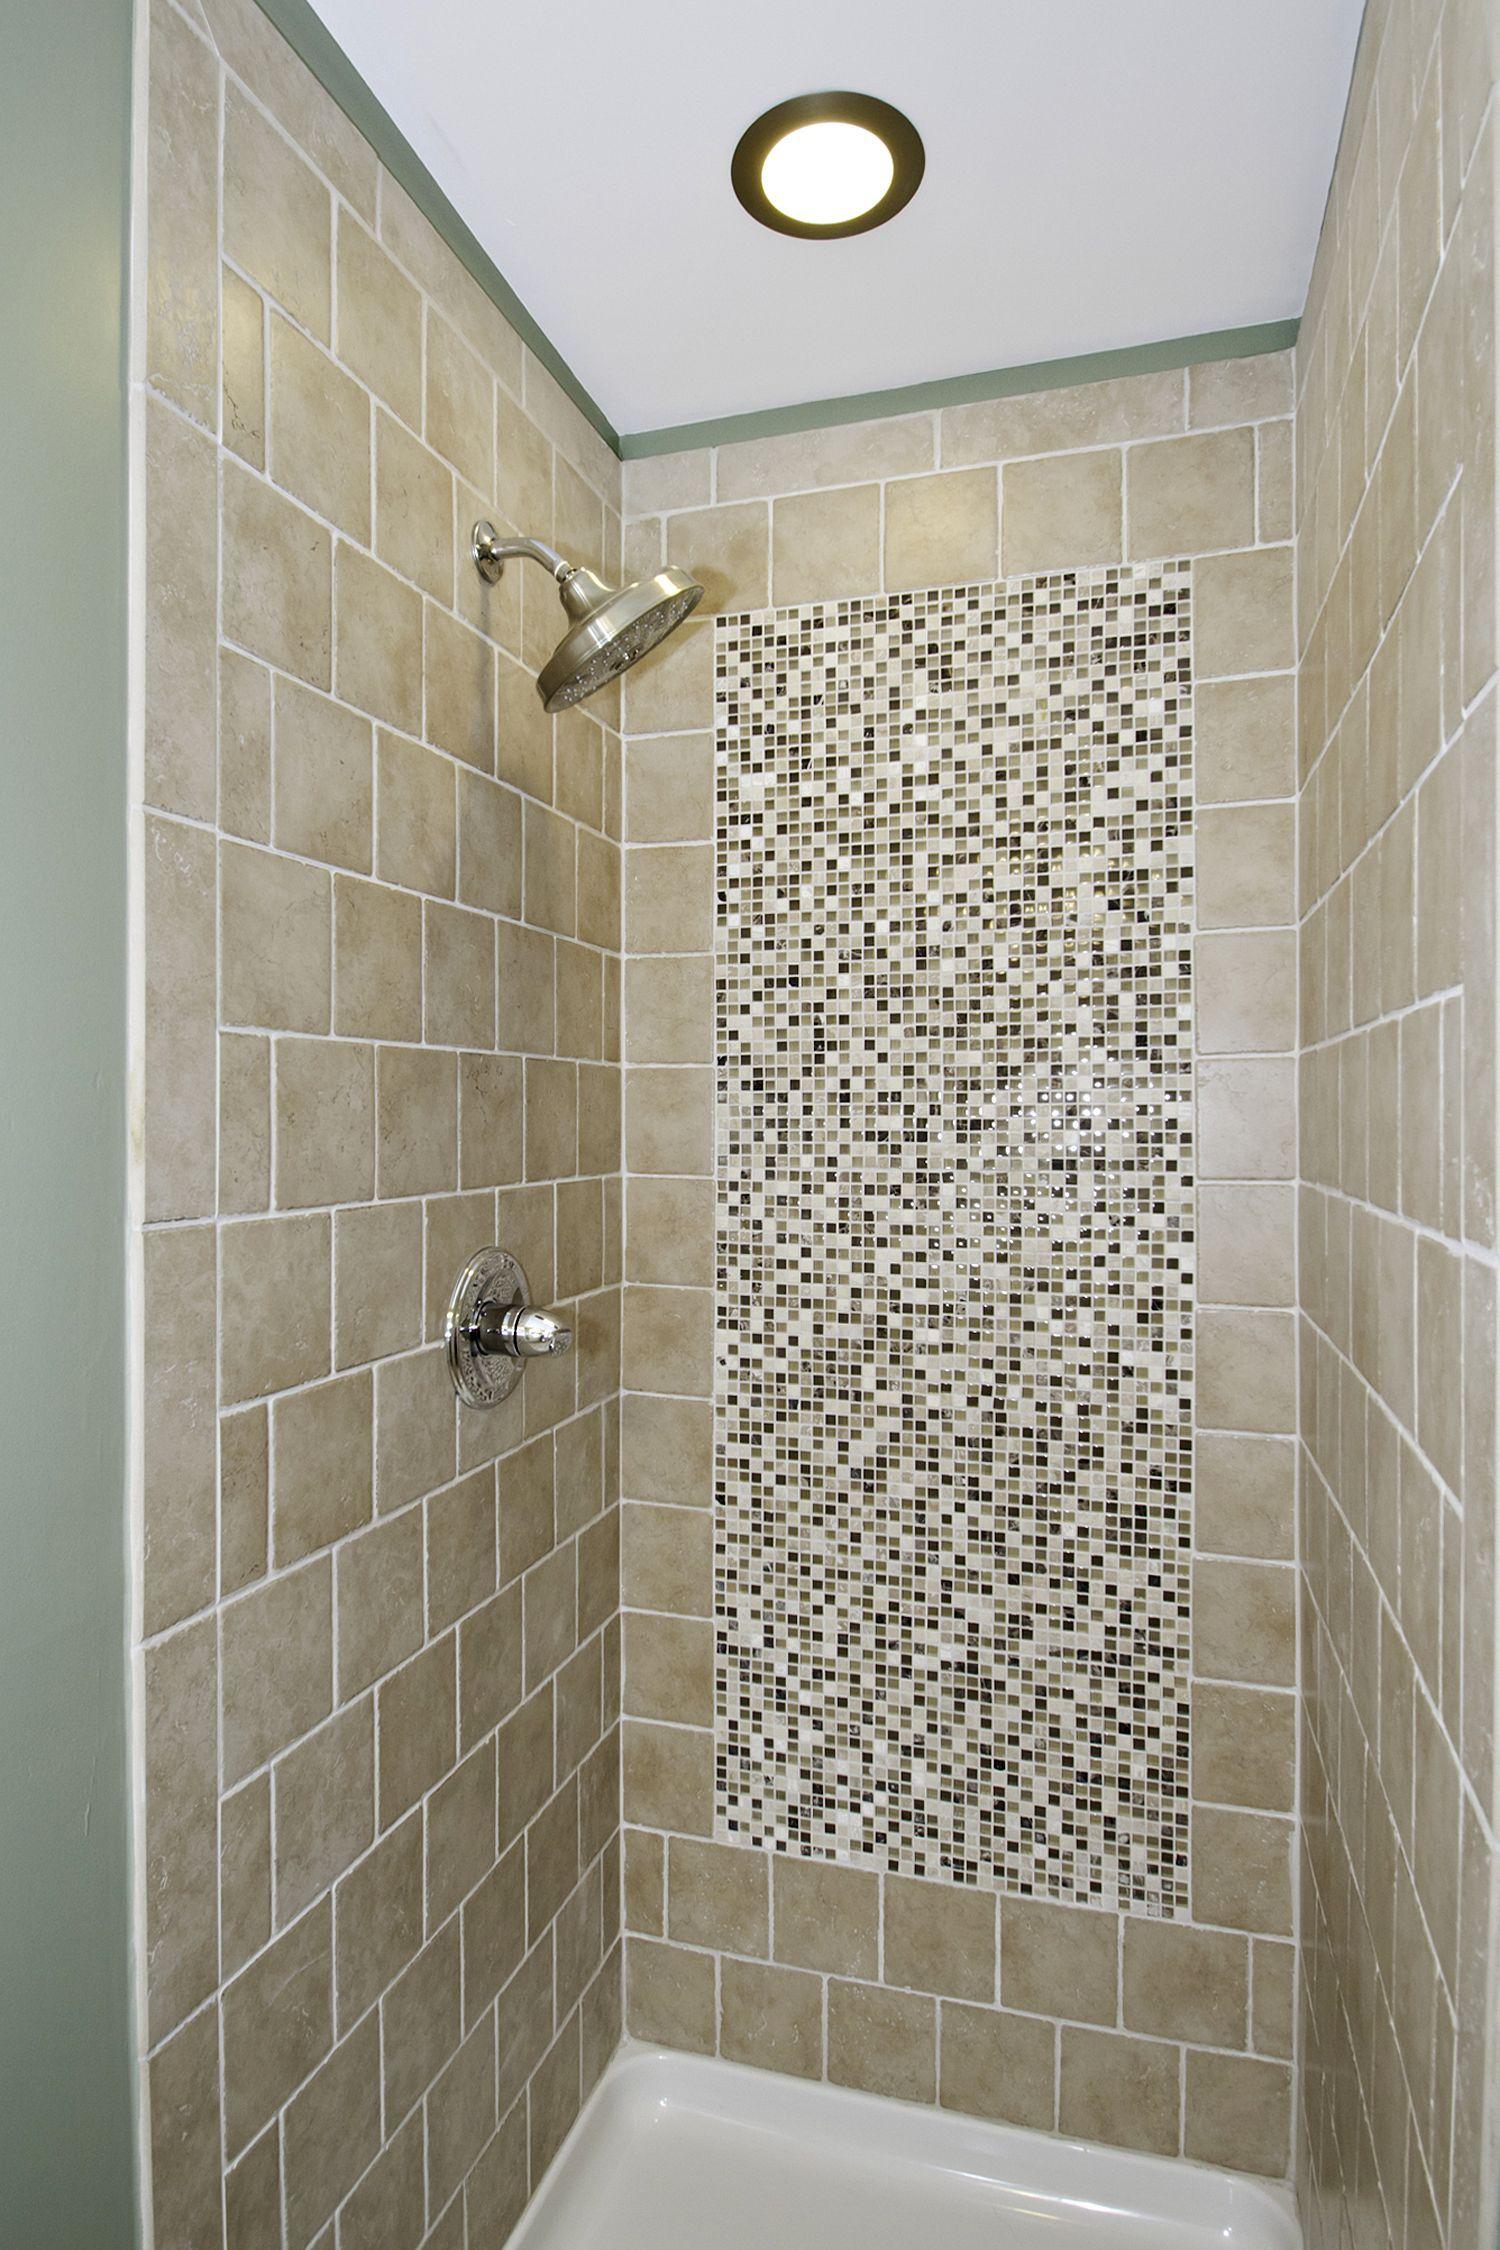 flooring ideas for small bathrooms%0A superbstandupshowerwithenclosureandacrylic